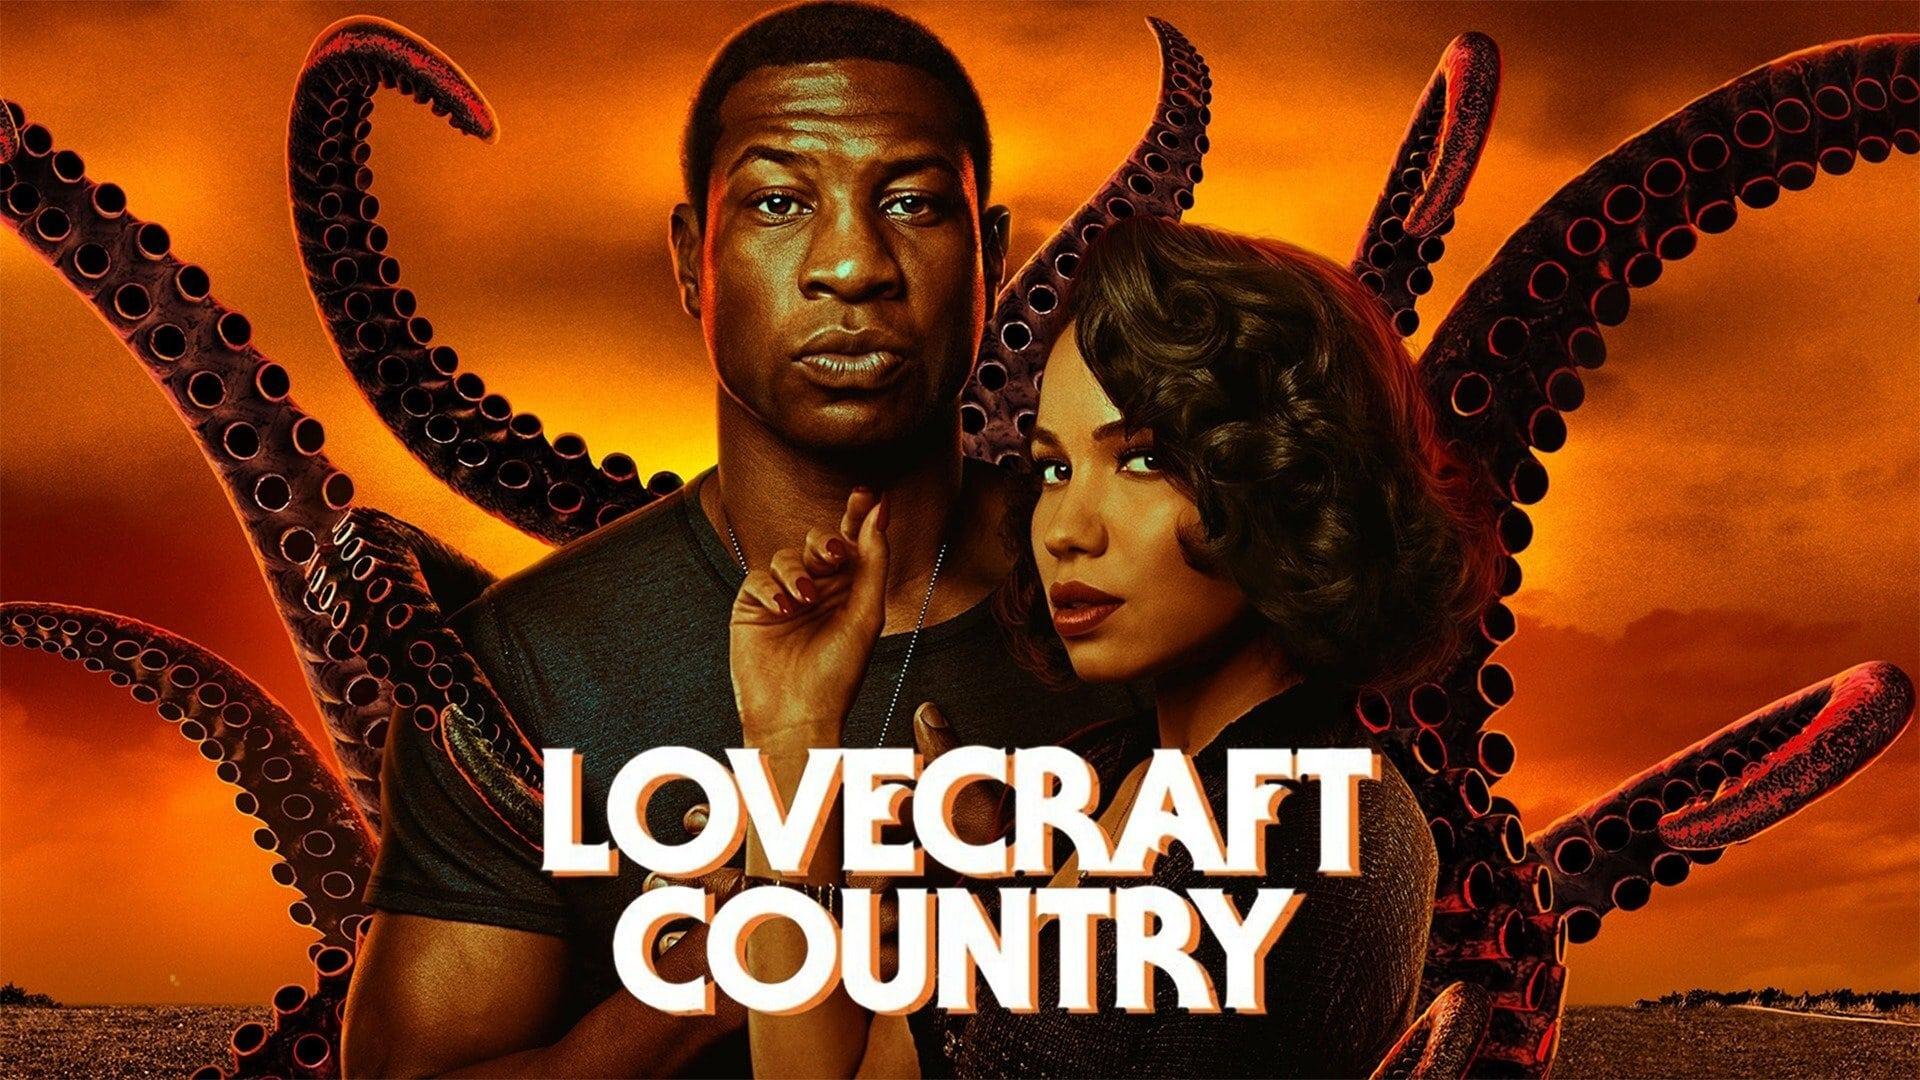 720p~ Lovecraft Country Season 1 Episode 2